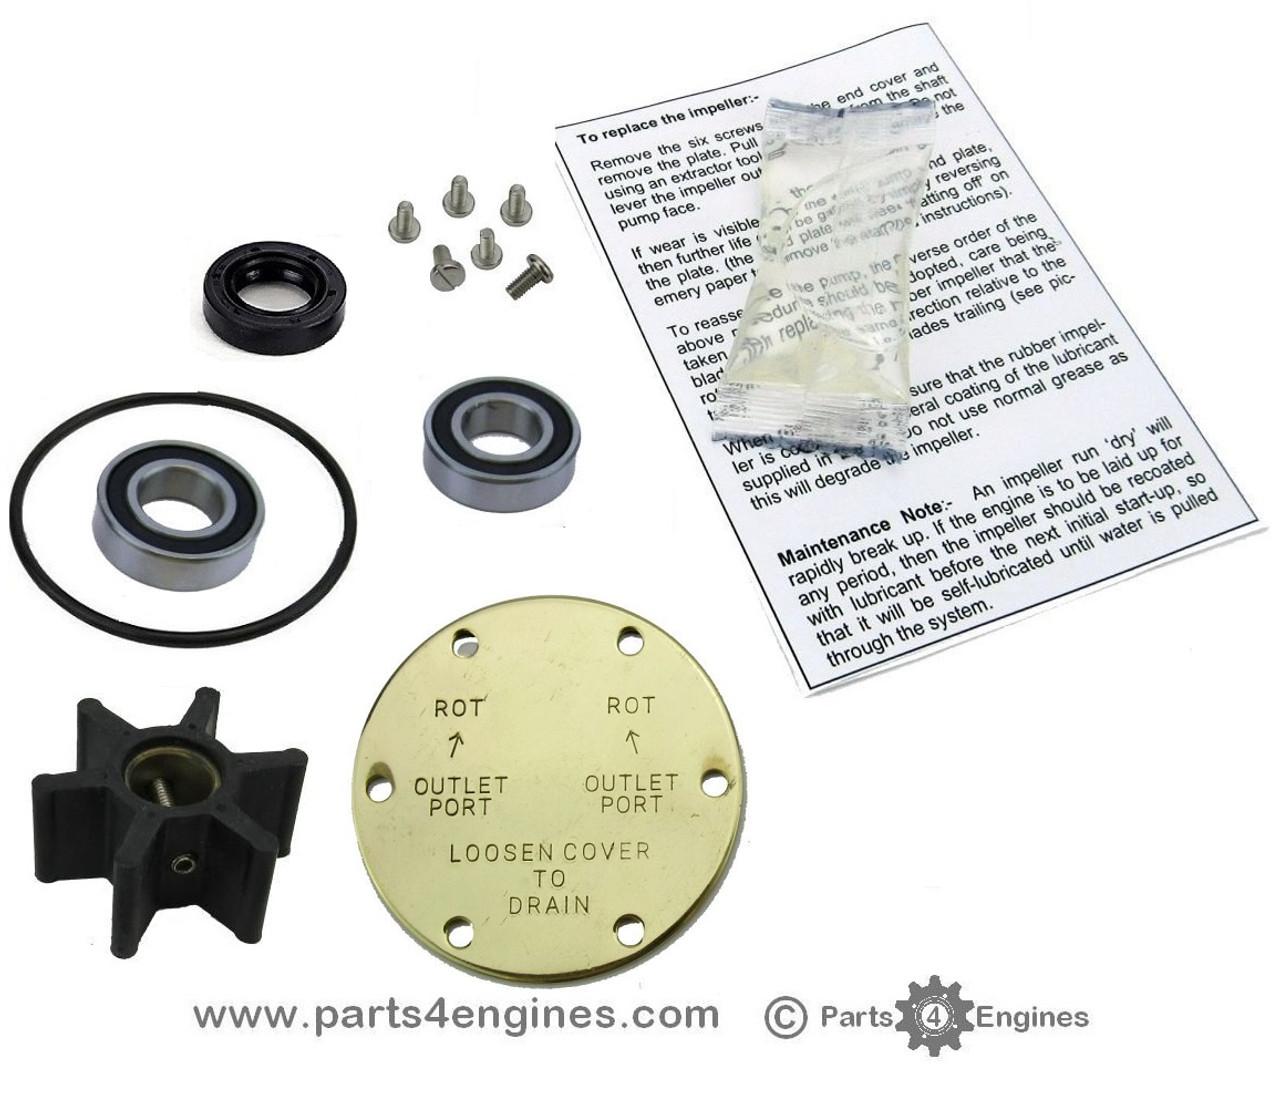 Yanmar 3YM30 Raw water pump rebuild kit - parts4engines.com